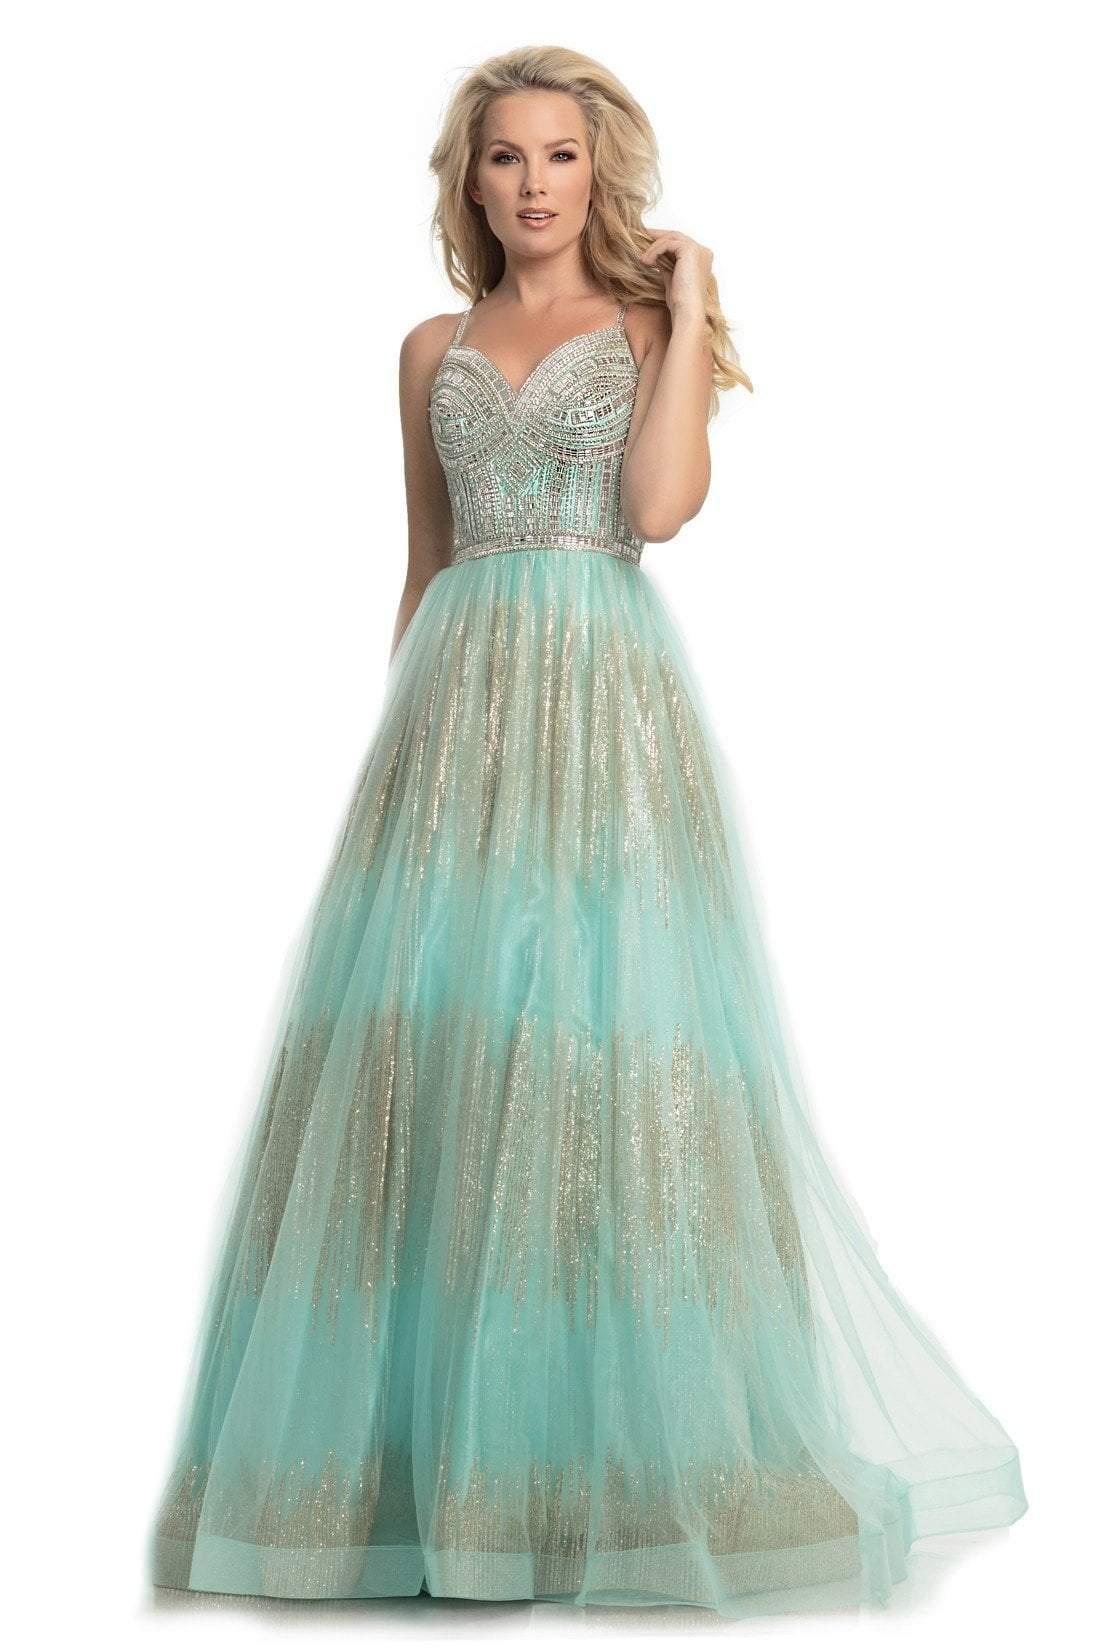 Johnathan Kayne - 9067 Sleeveless Sparkly Glitter Mesh A-Line Gown